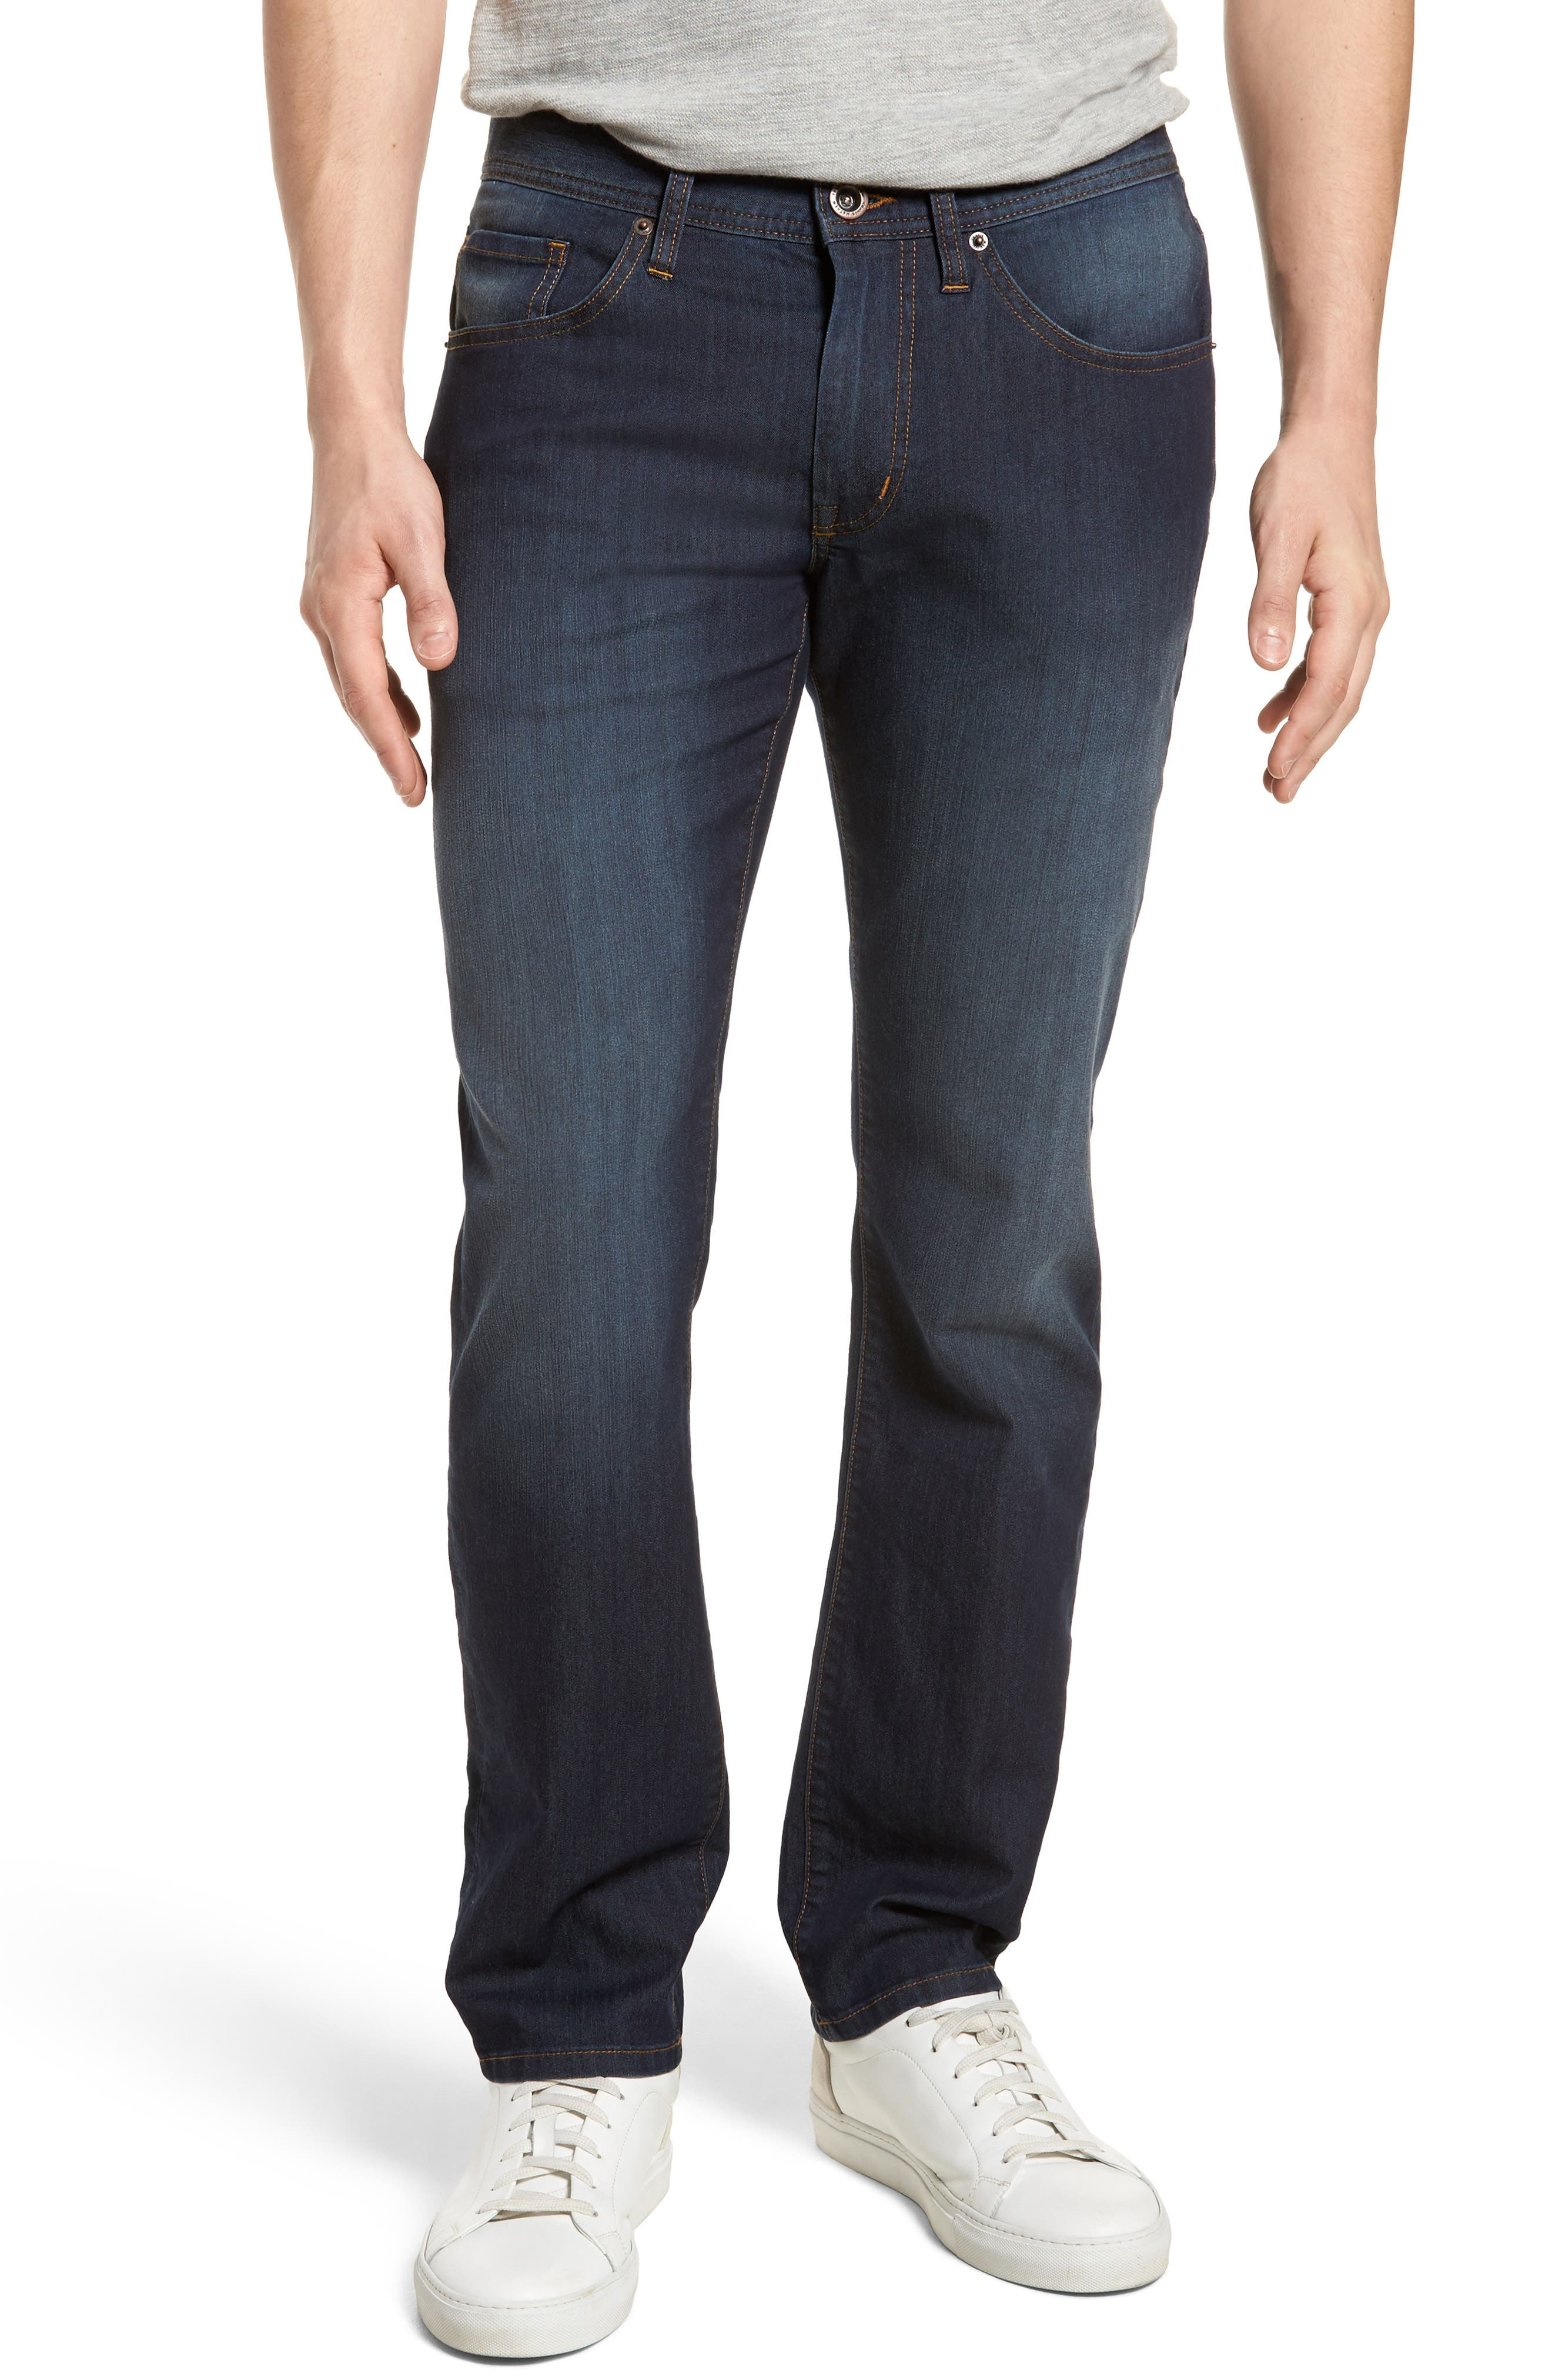 Alternate Image 1 Selected - Travis Mathew The 101 Regular Fit Straight Leg Jeans